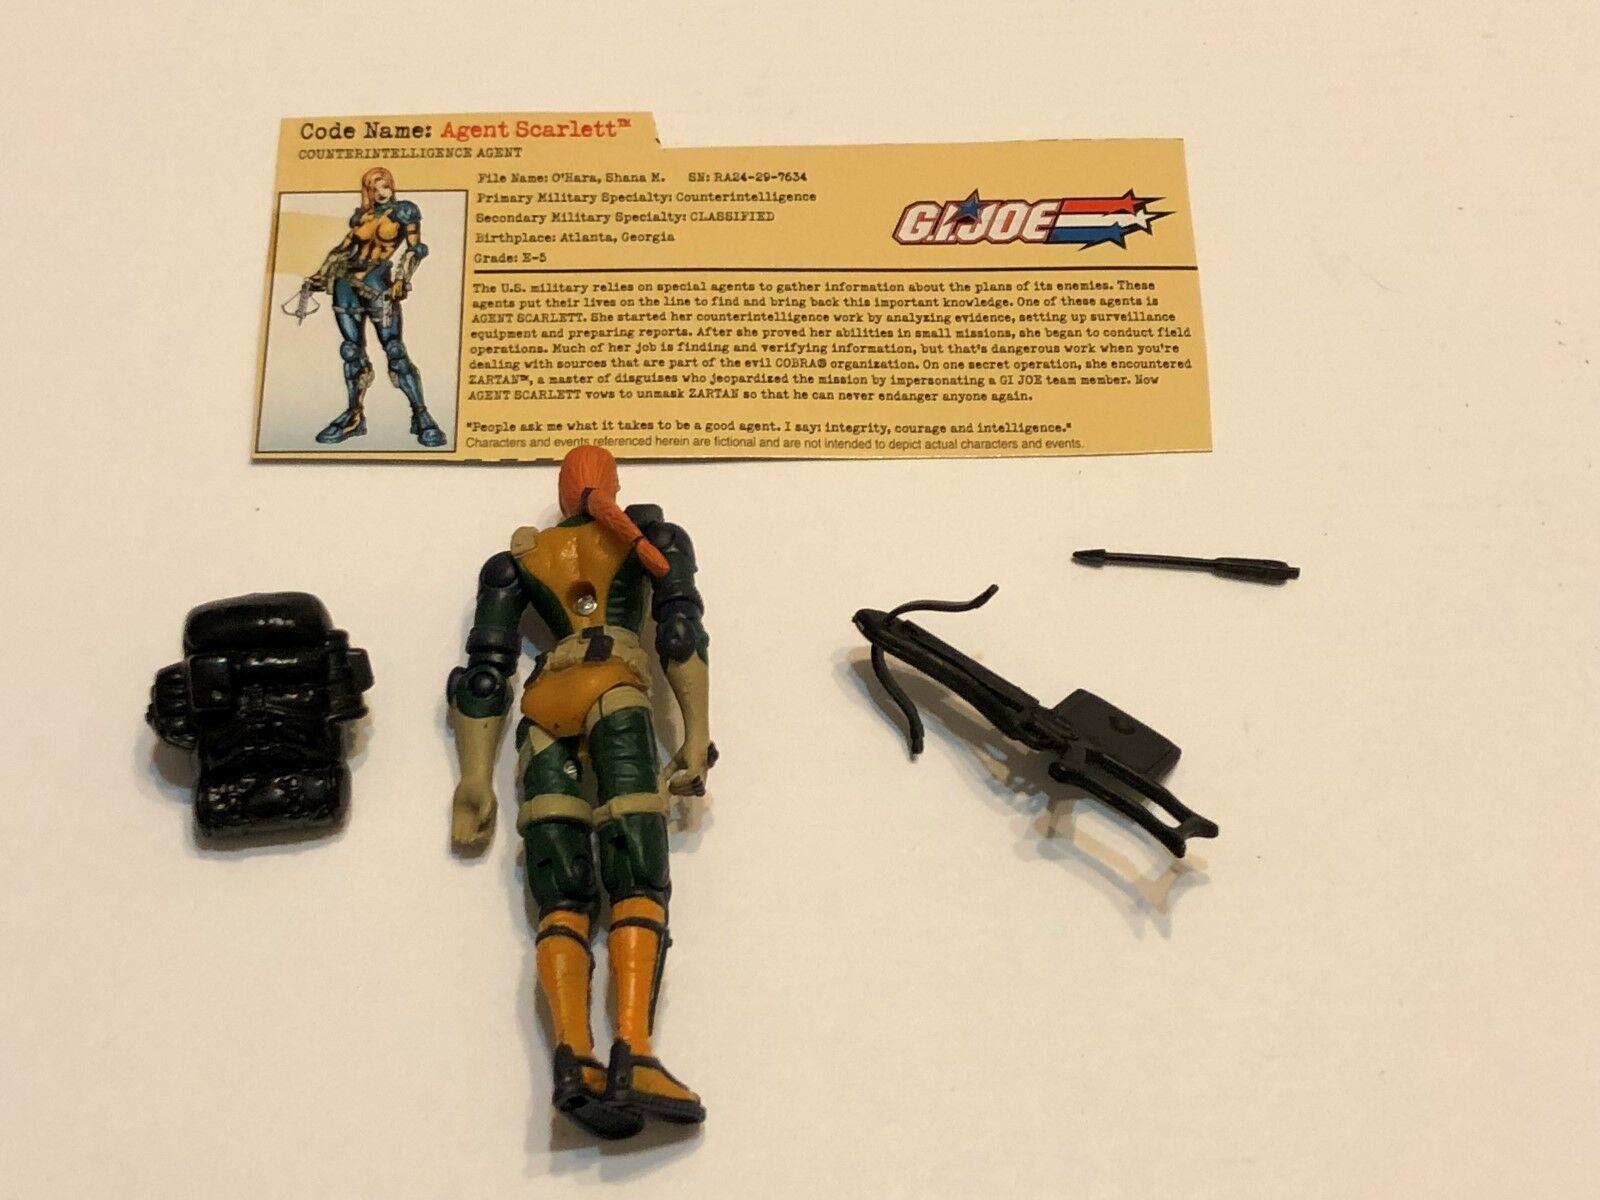 2002 G.I. JOE Action Figure Agent Scarlett ( Ref # 4-14 ) image 2